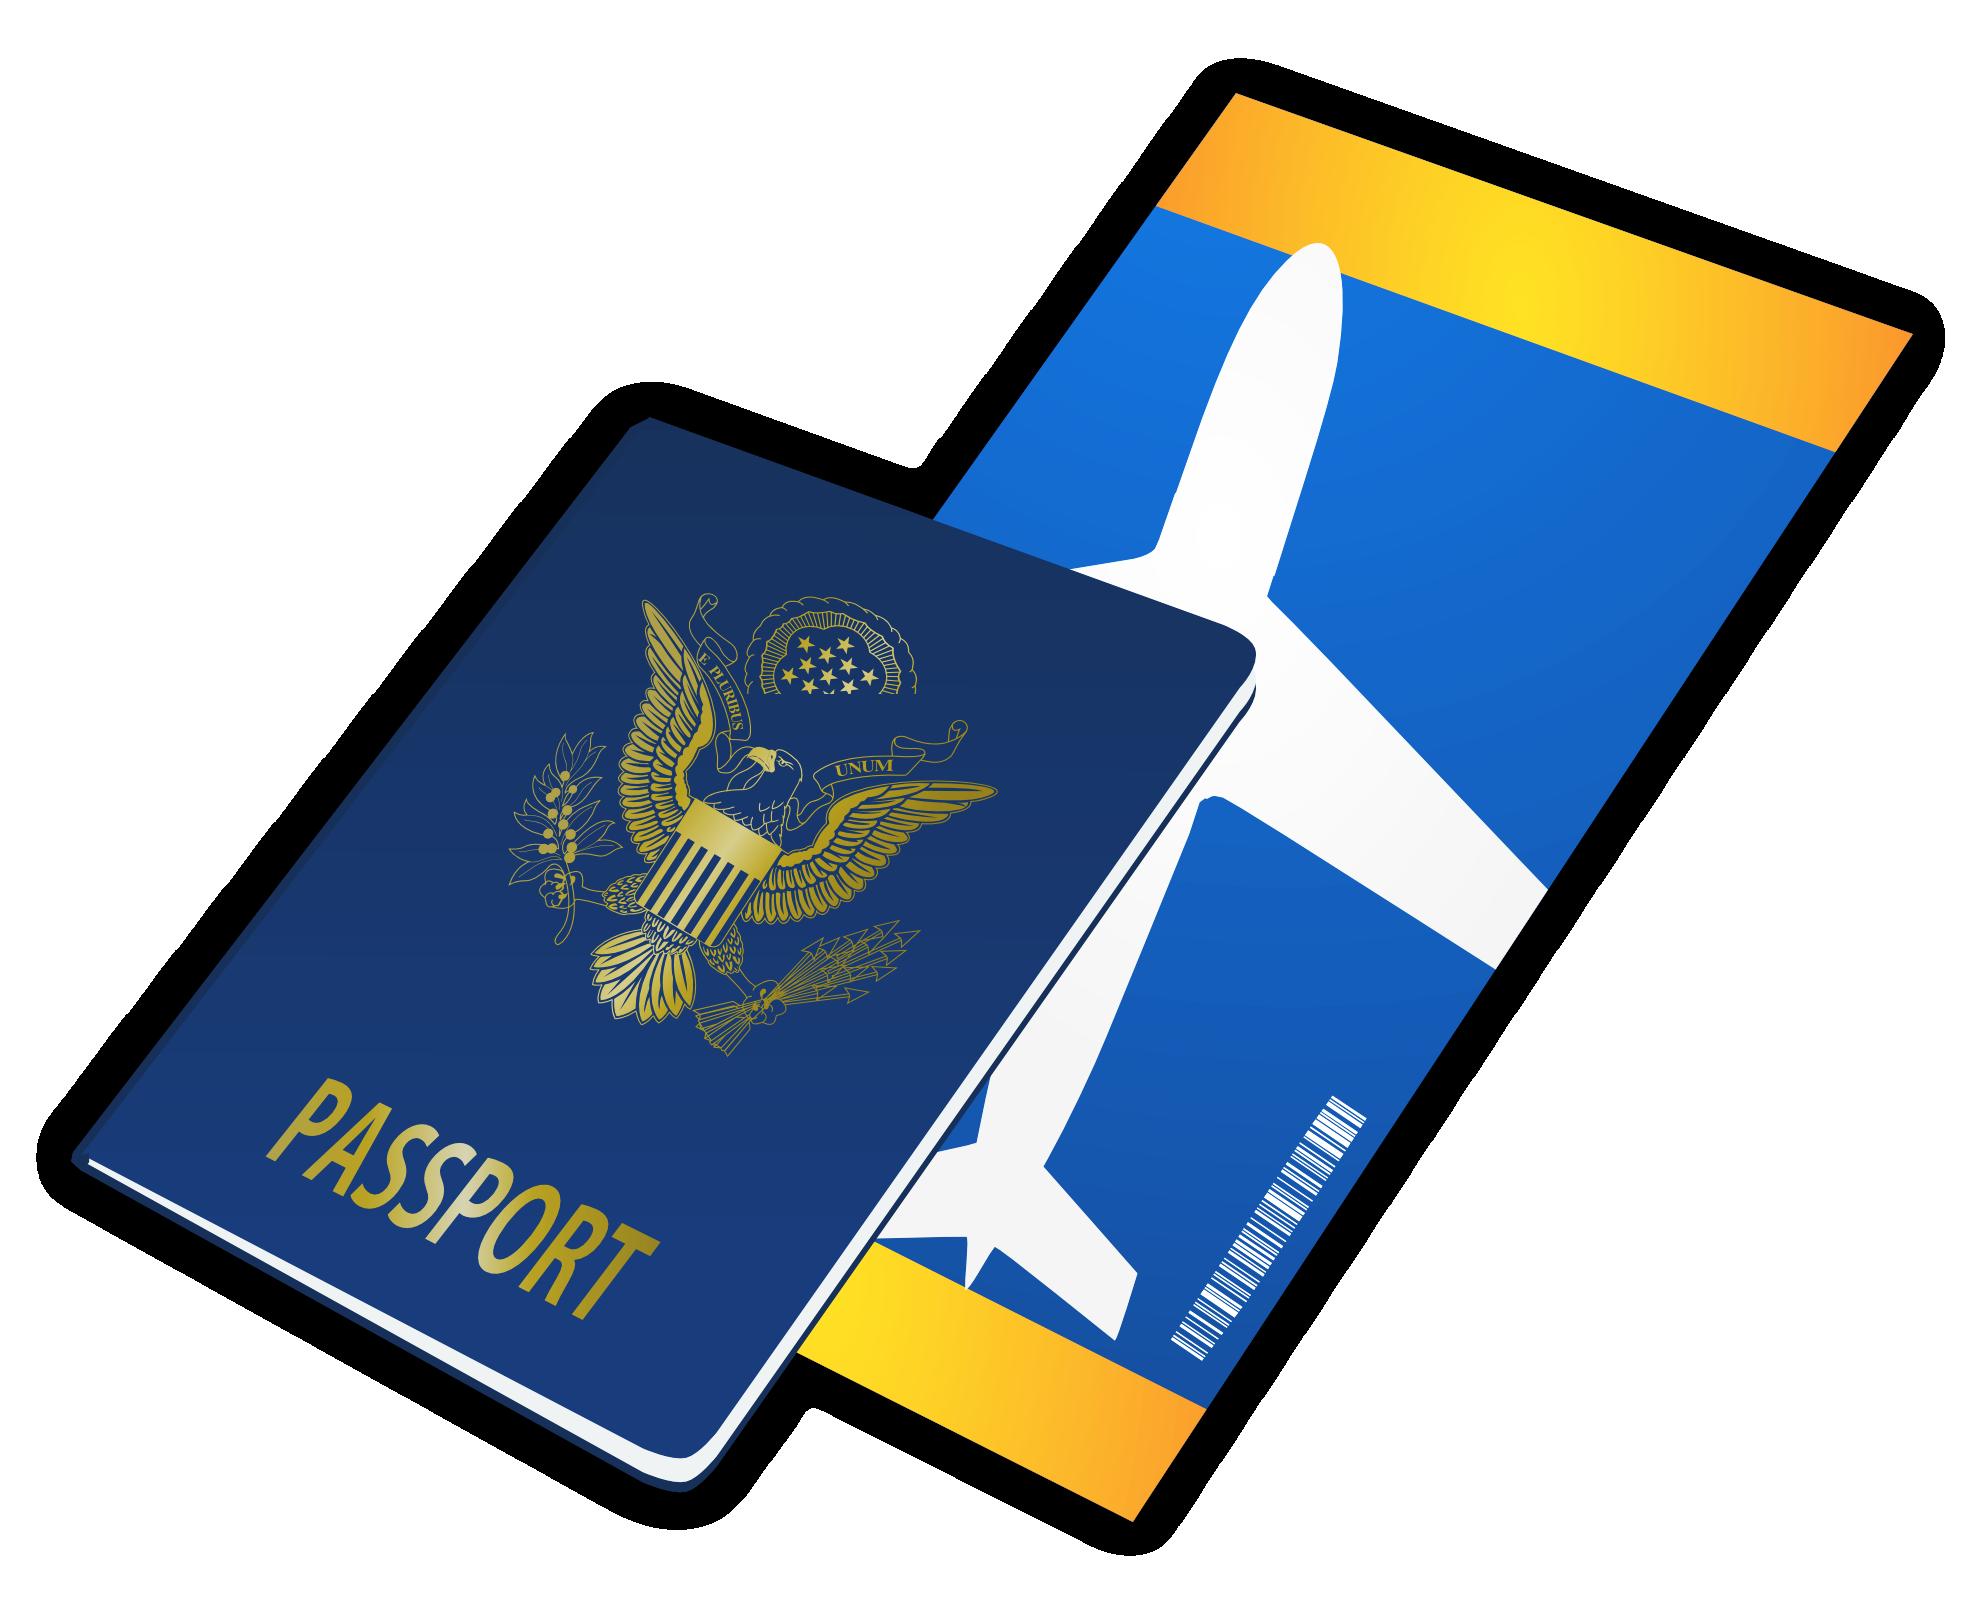 Png image best stock. Passport clipart transparent background passport